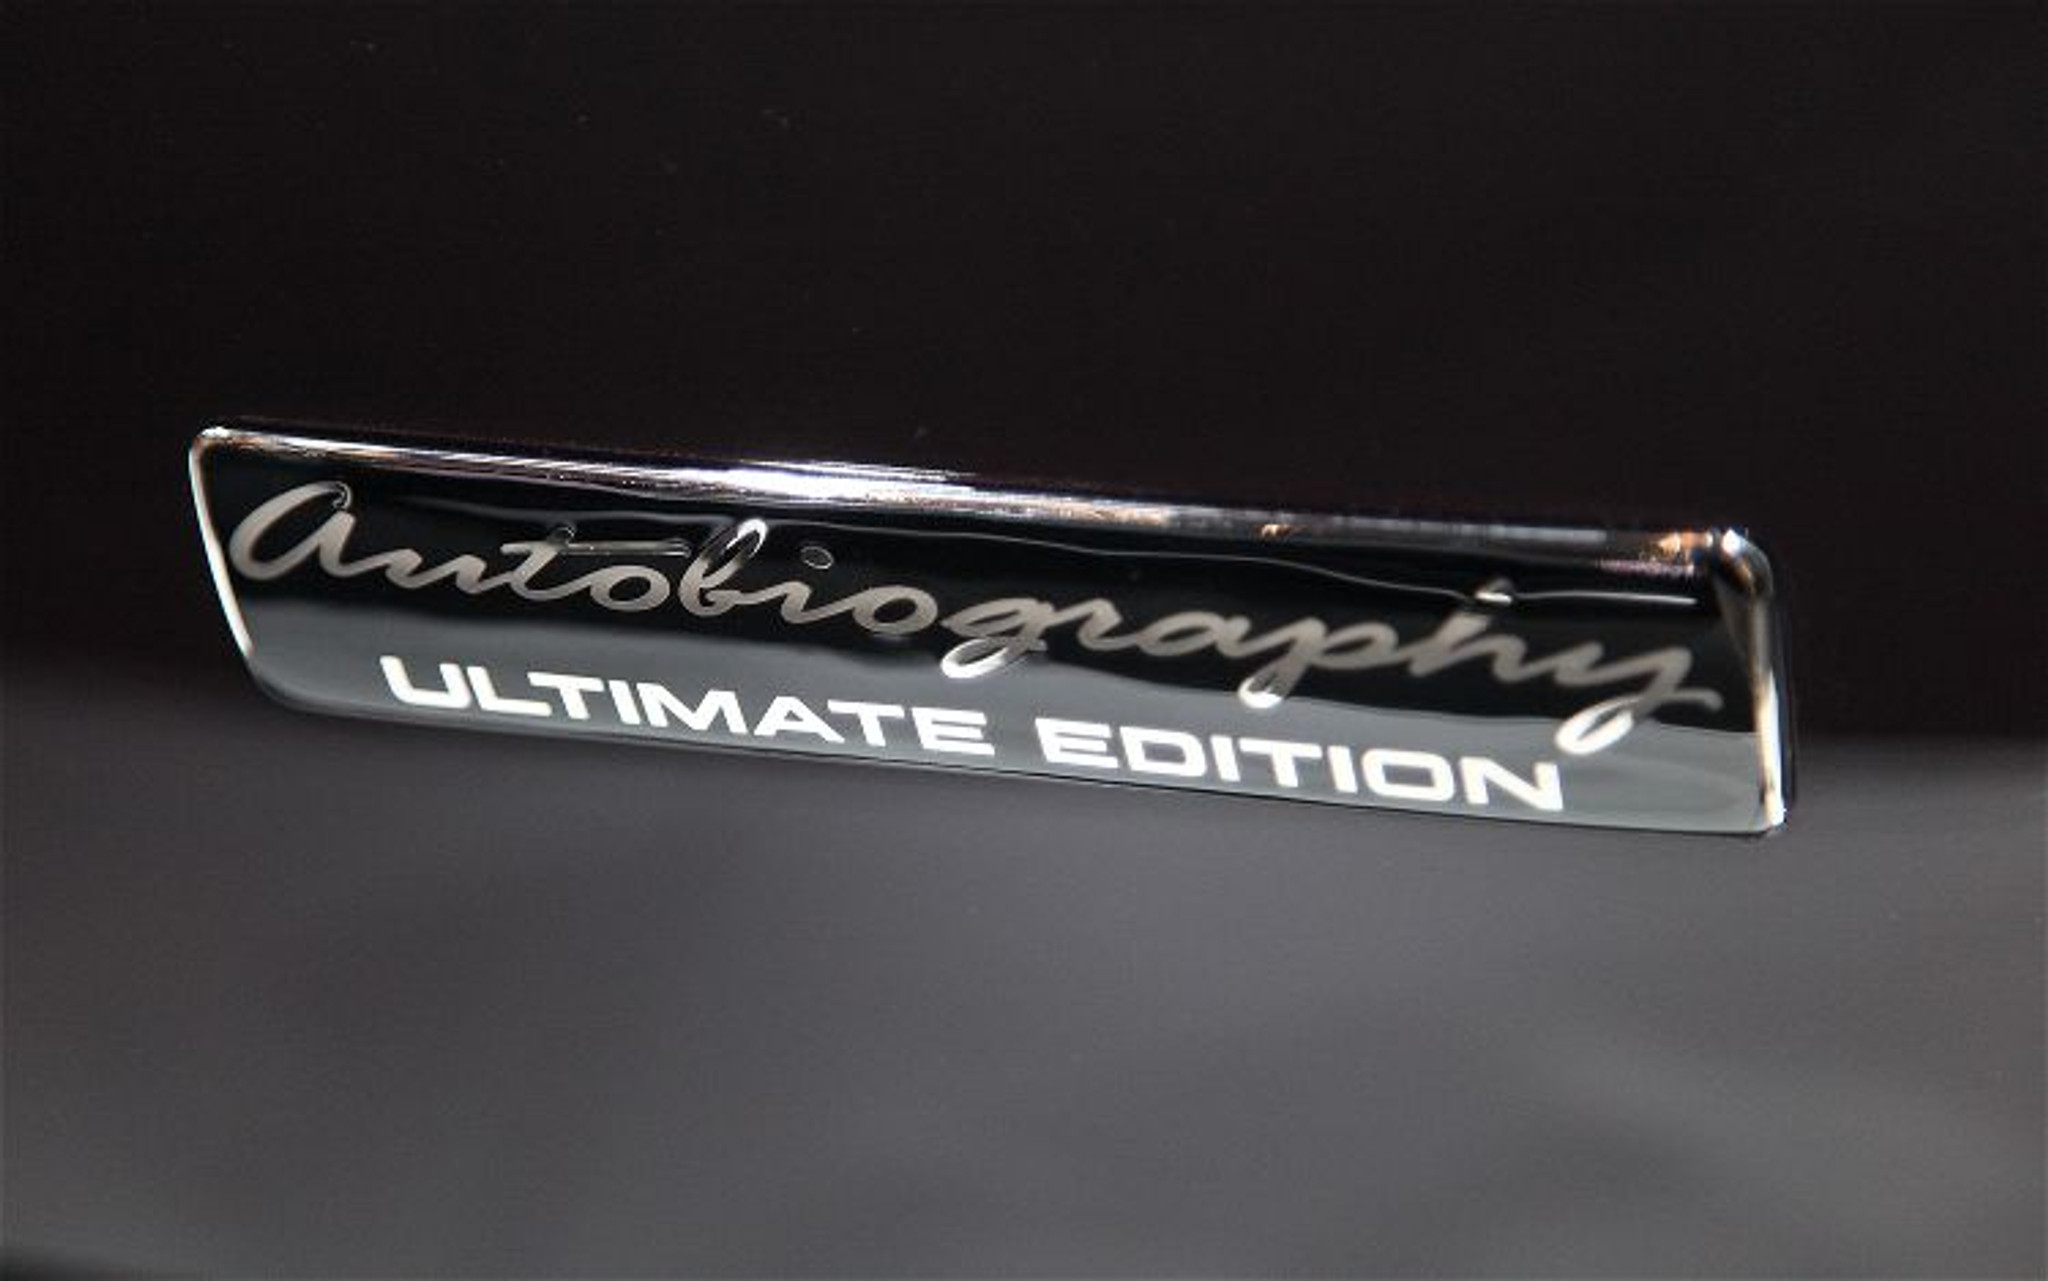 Range Rover Vogue 2012 Autobiography Ultimate Bodykit